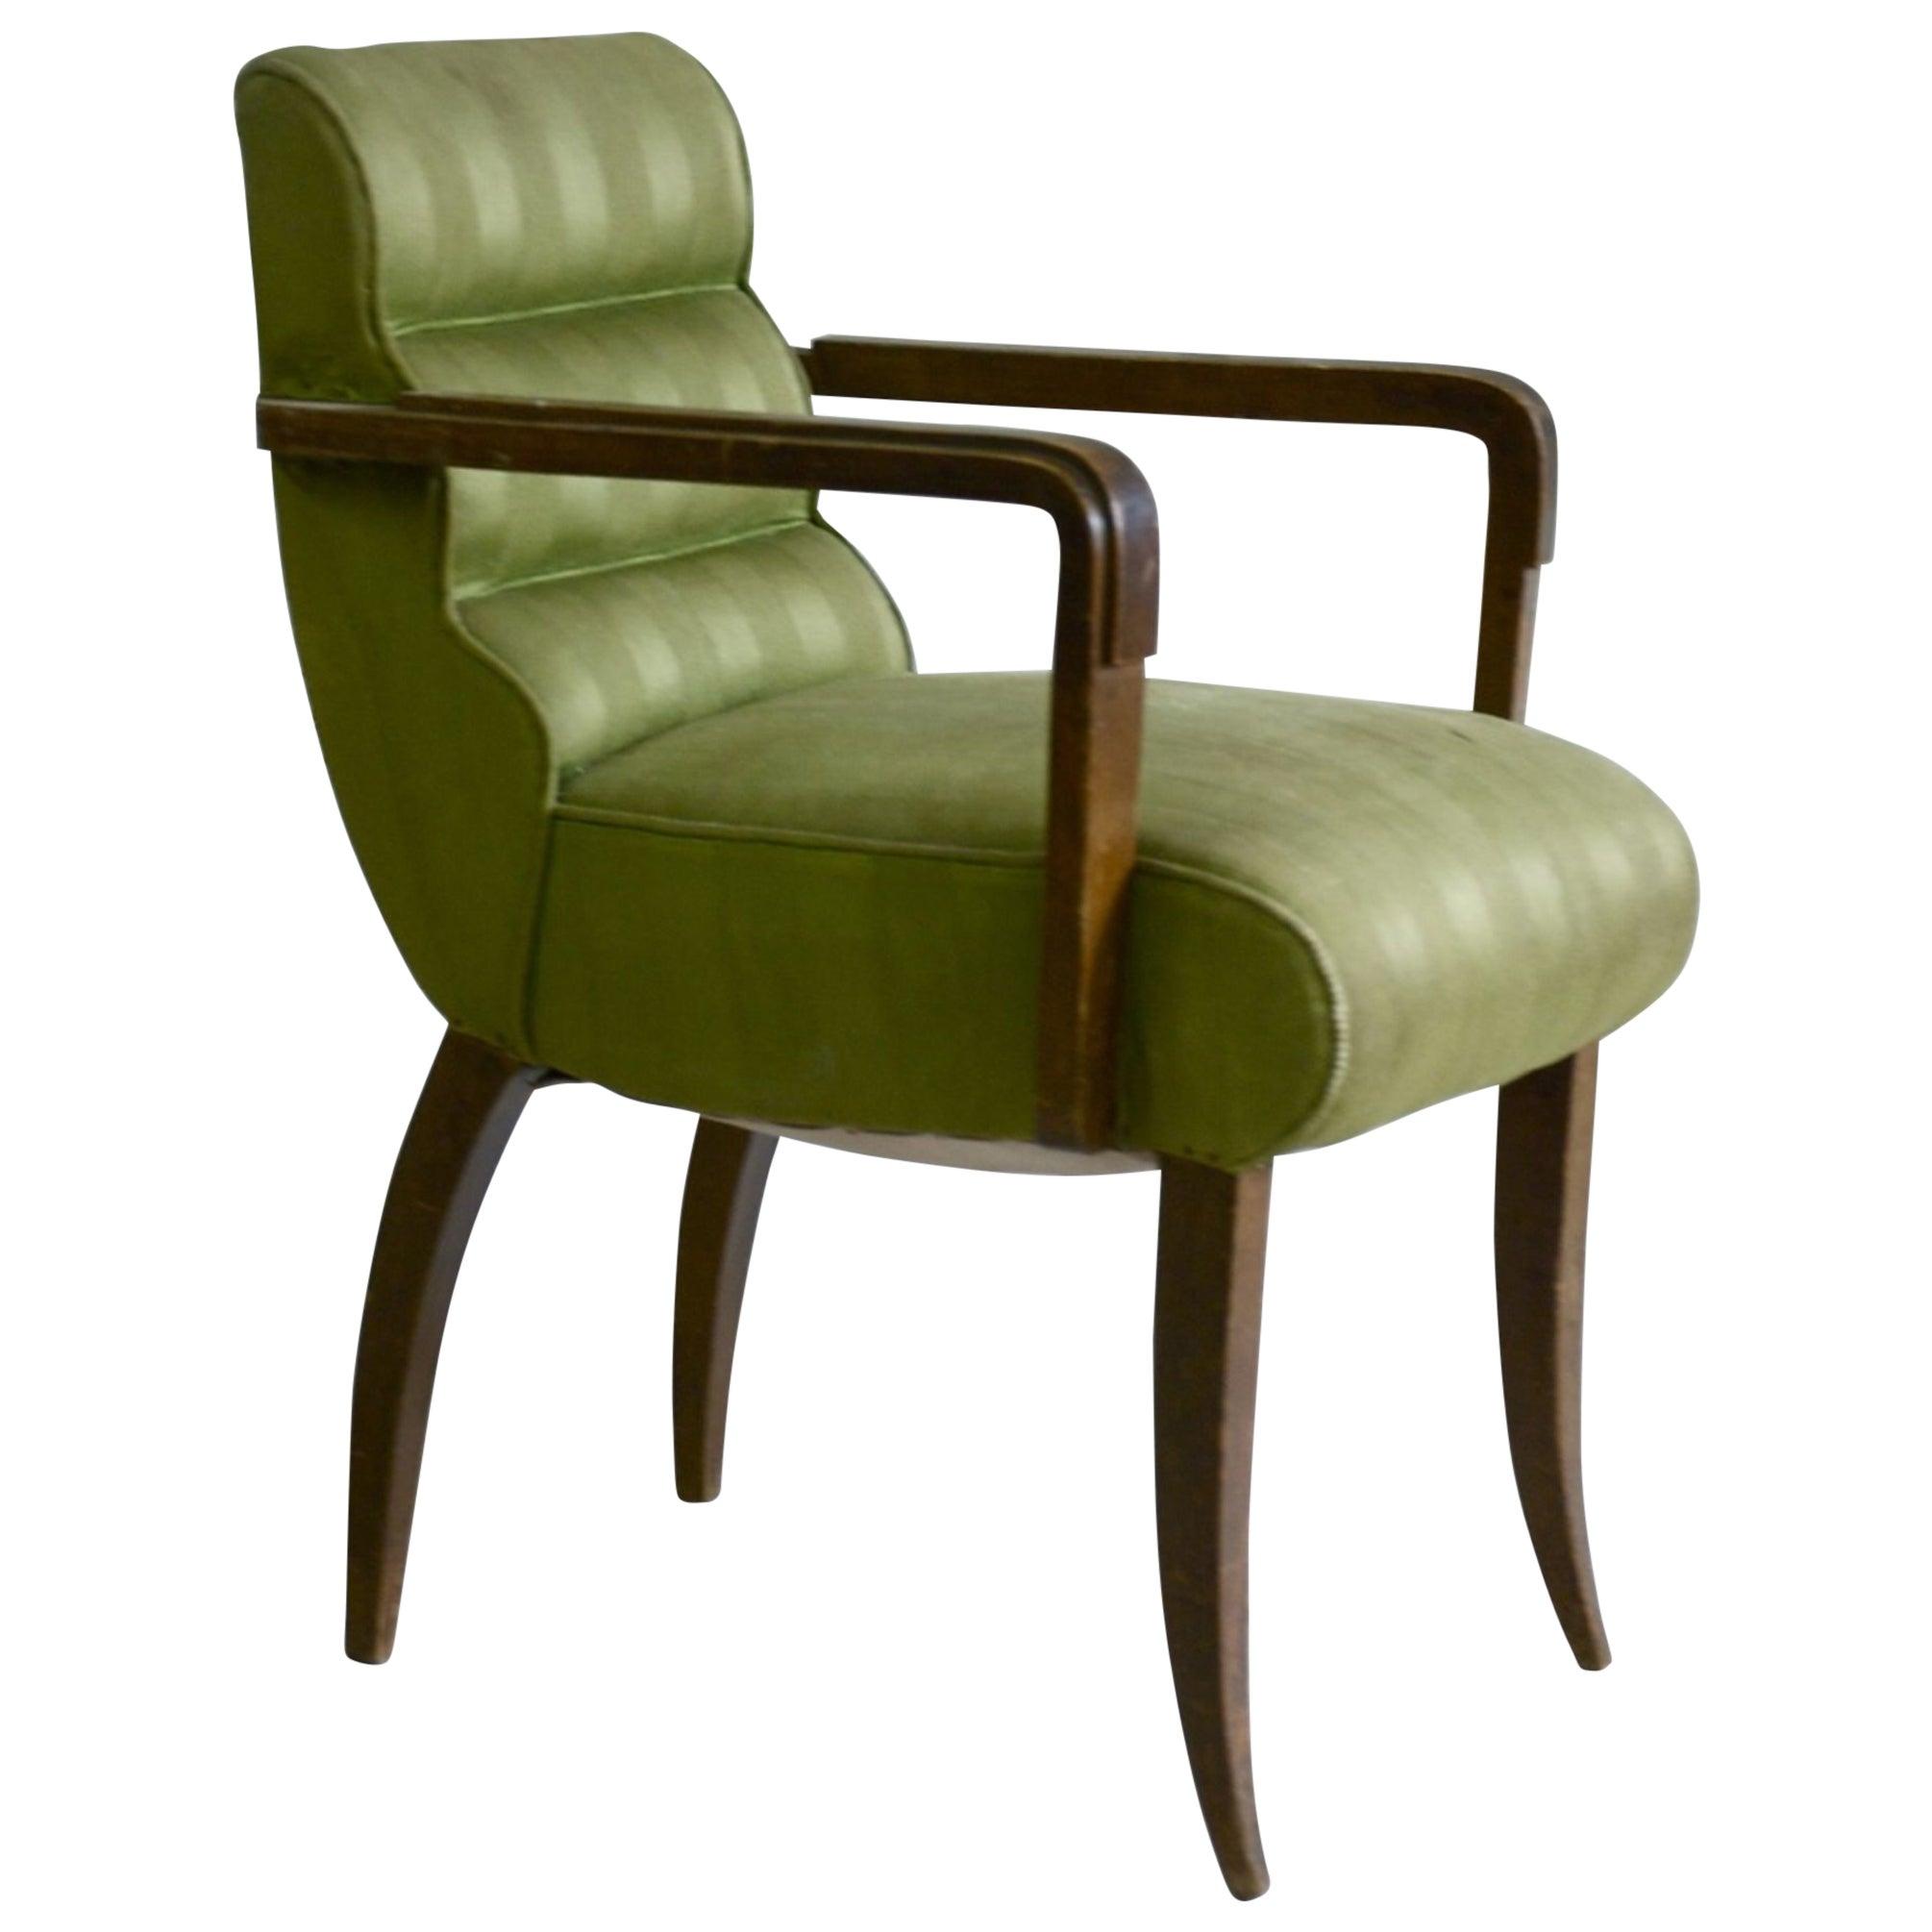 Rene Prou Pair of Petite Scale Armchairs